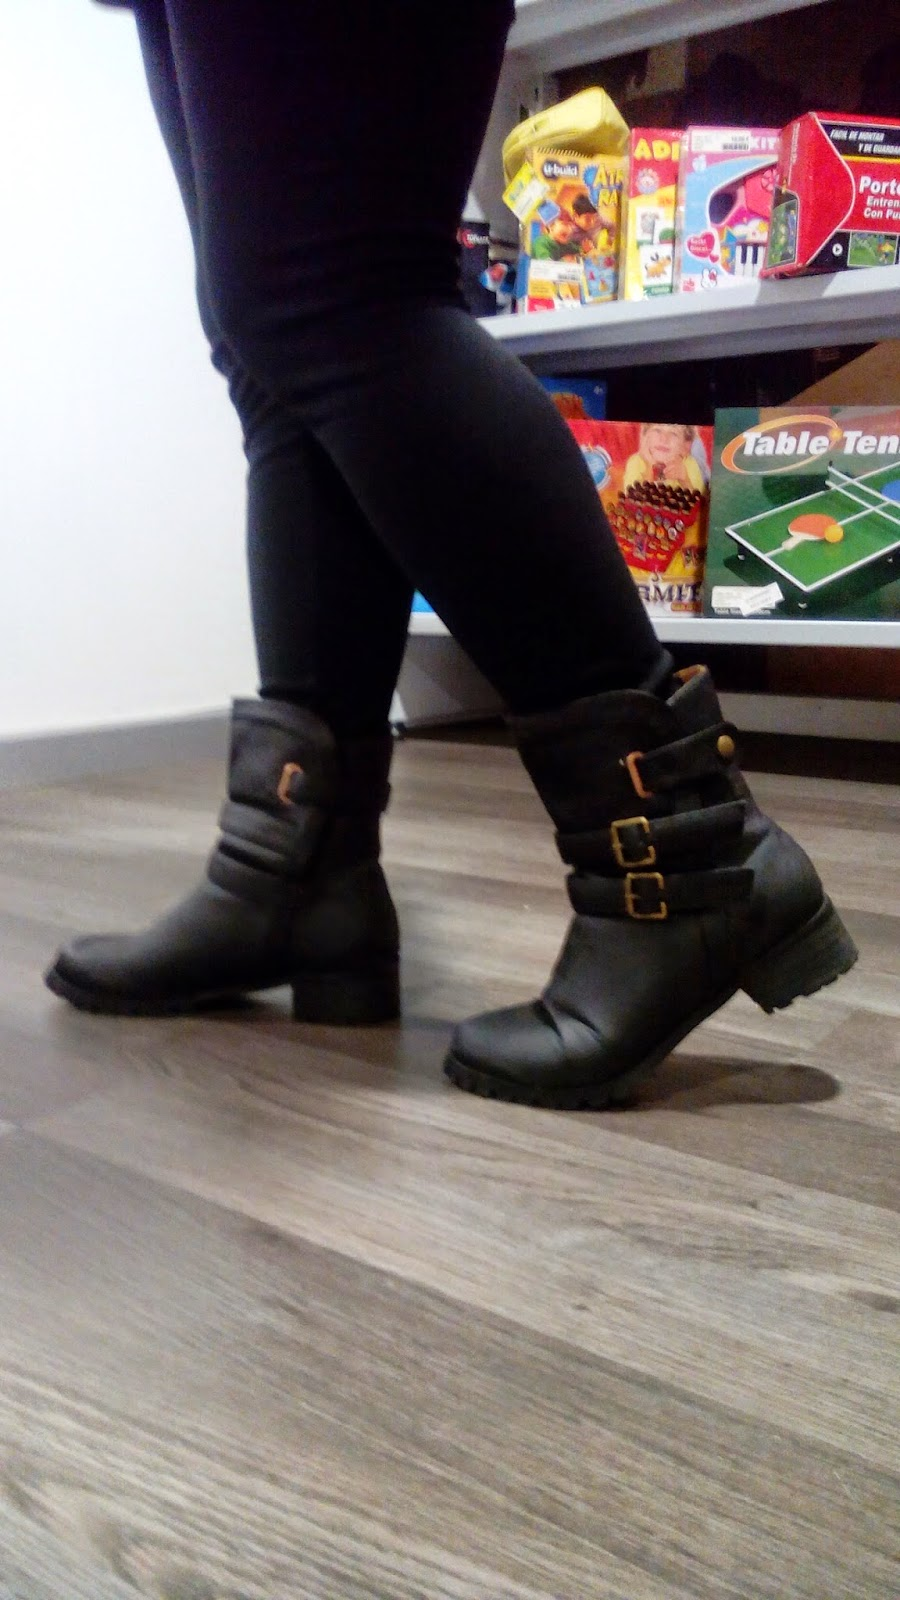 http://www.oasap.com/trousers-leggings/3838-anchored-leggings-with-inner-napping.html?fuid=98518